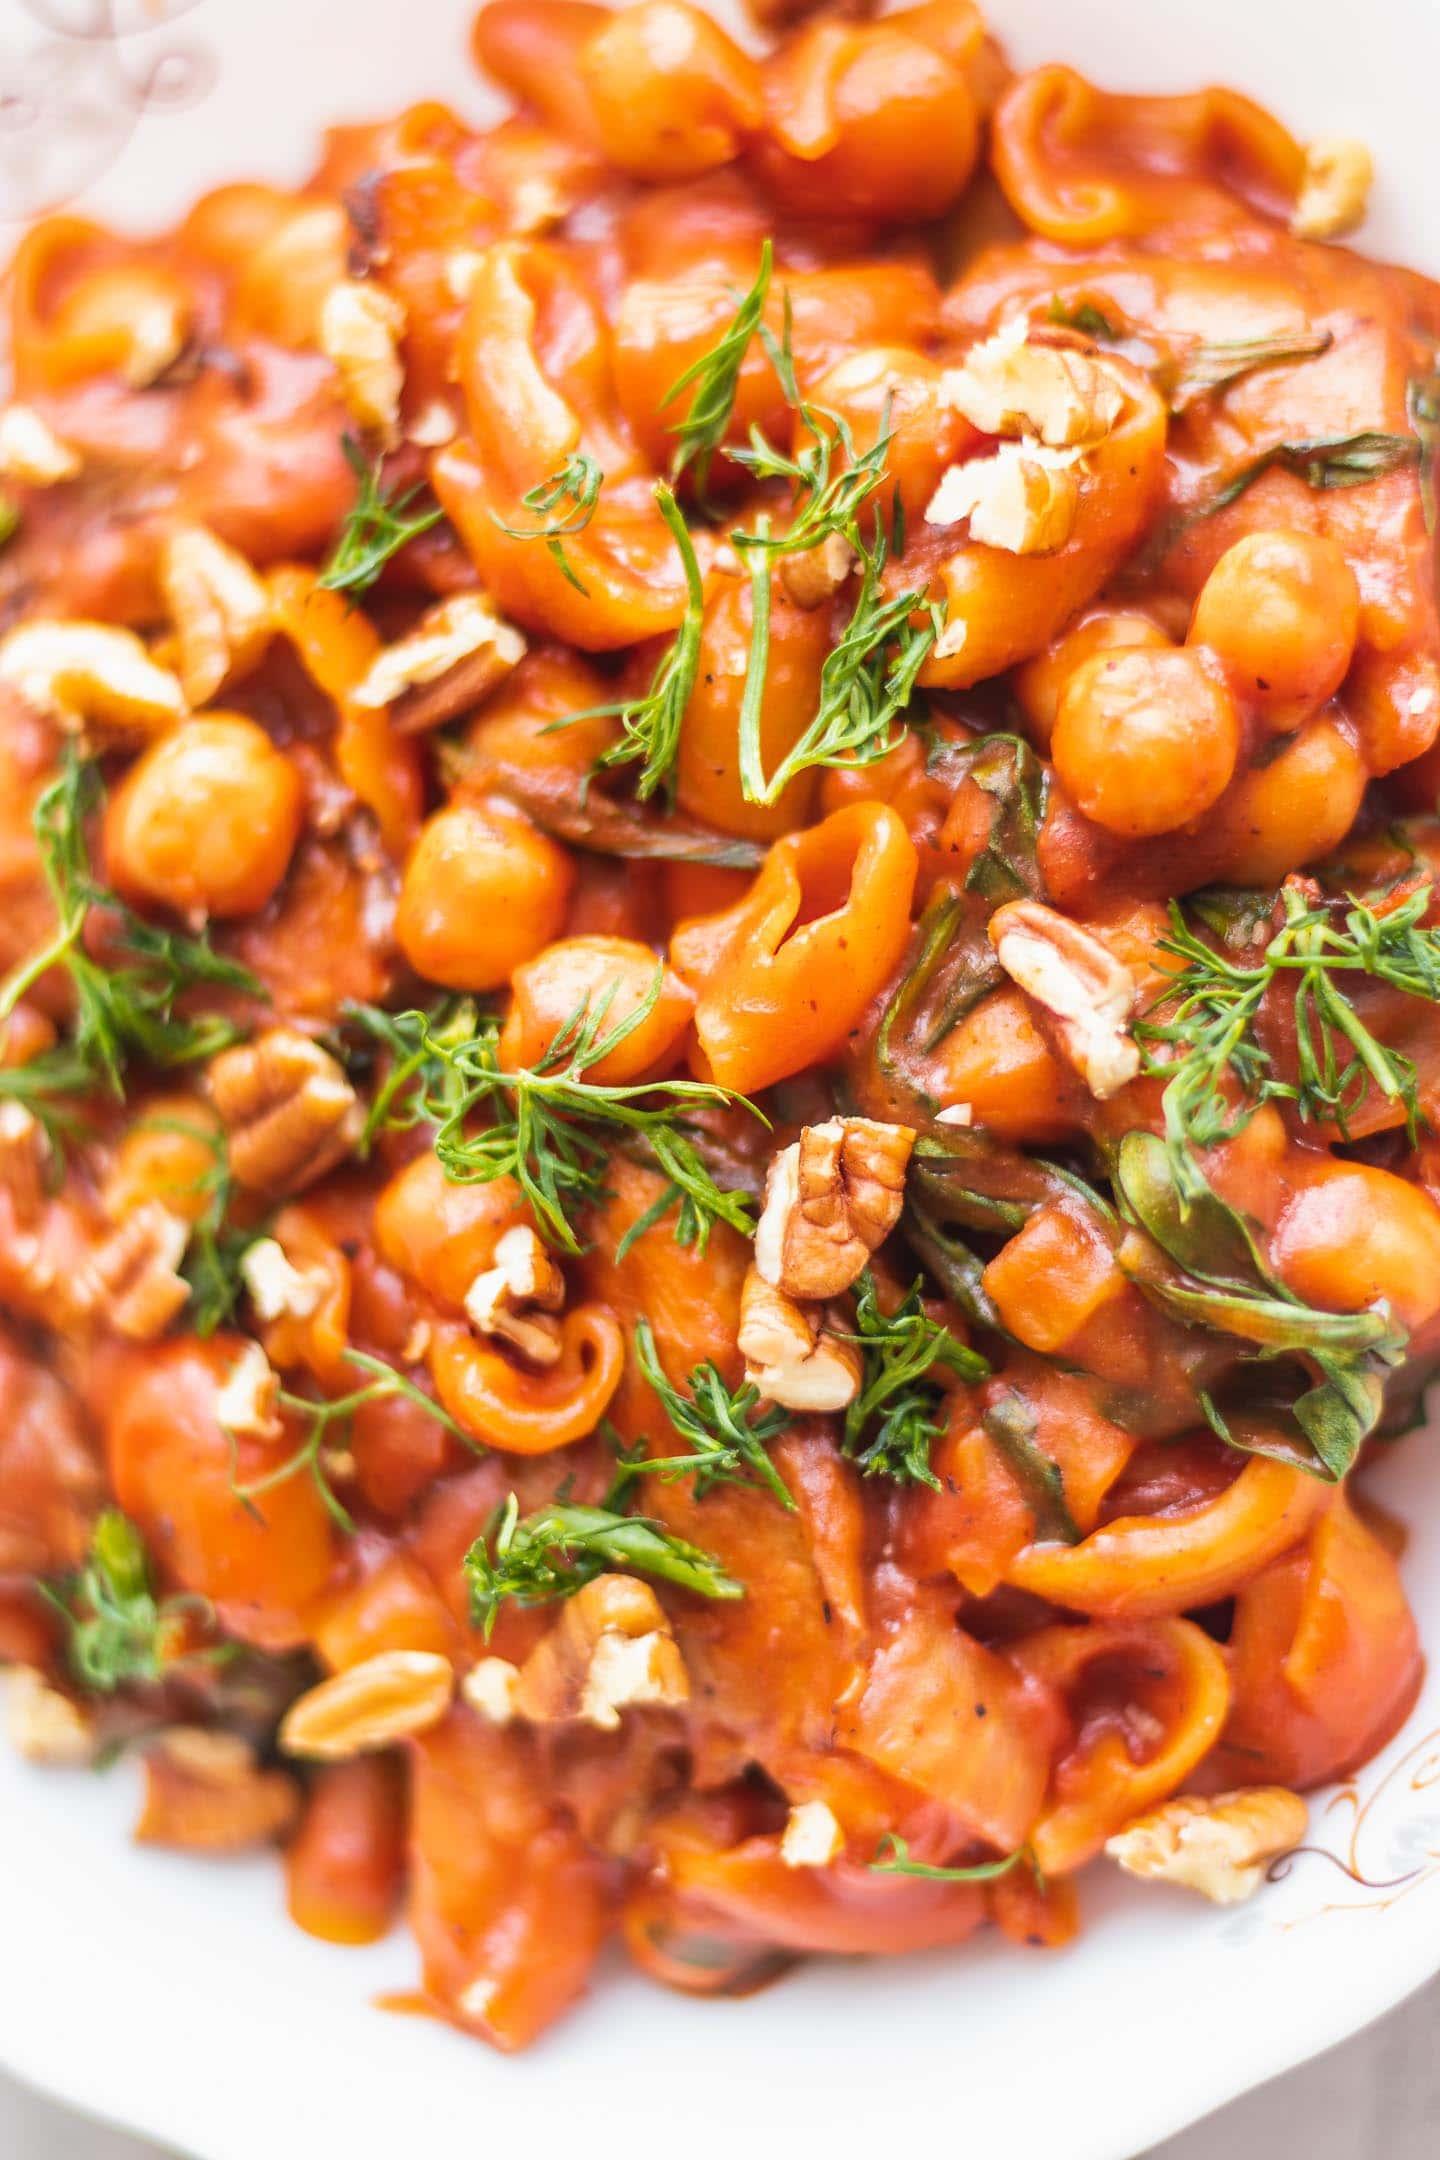 Closeup of vegan pasta with chickpeas